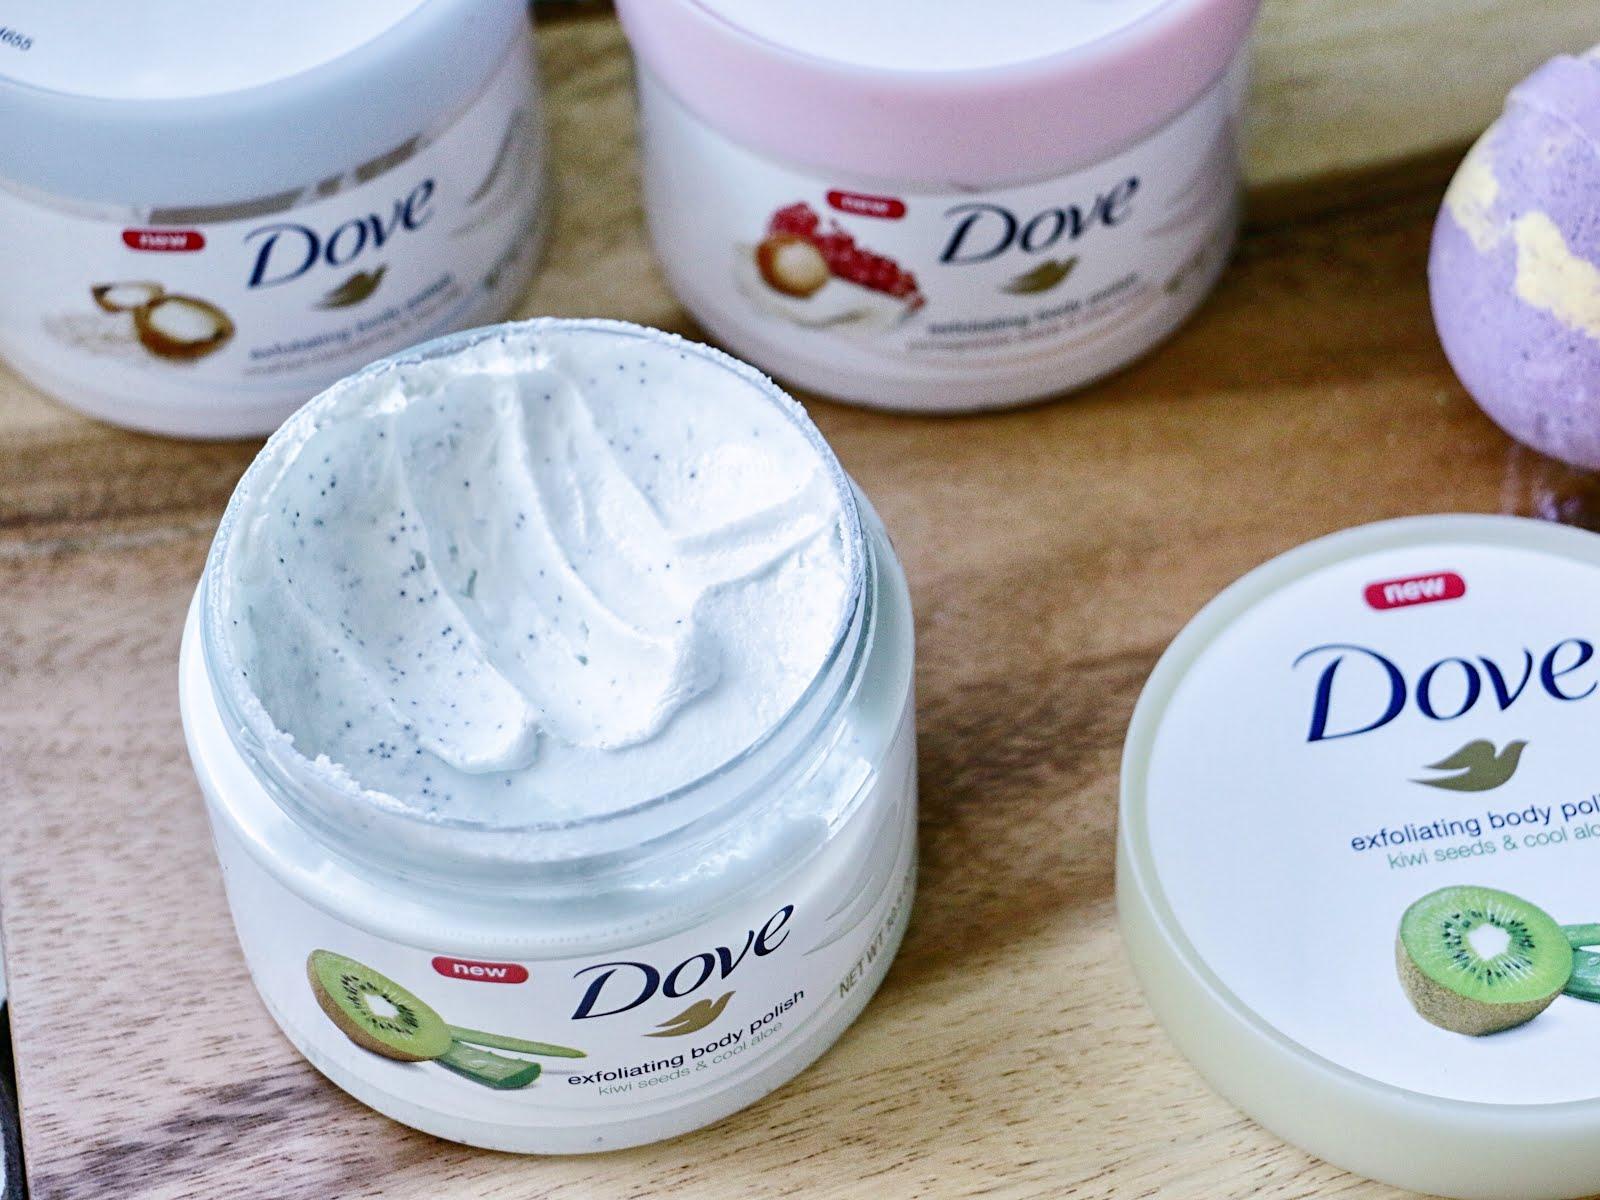 Dove-Exfoliating-Body-Polish-Vivi-Brizuela